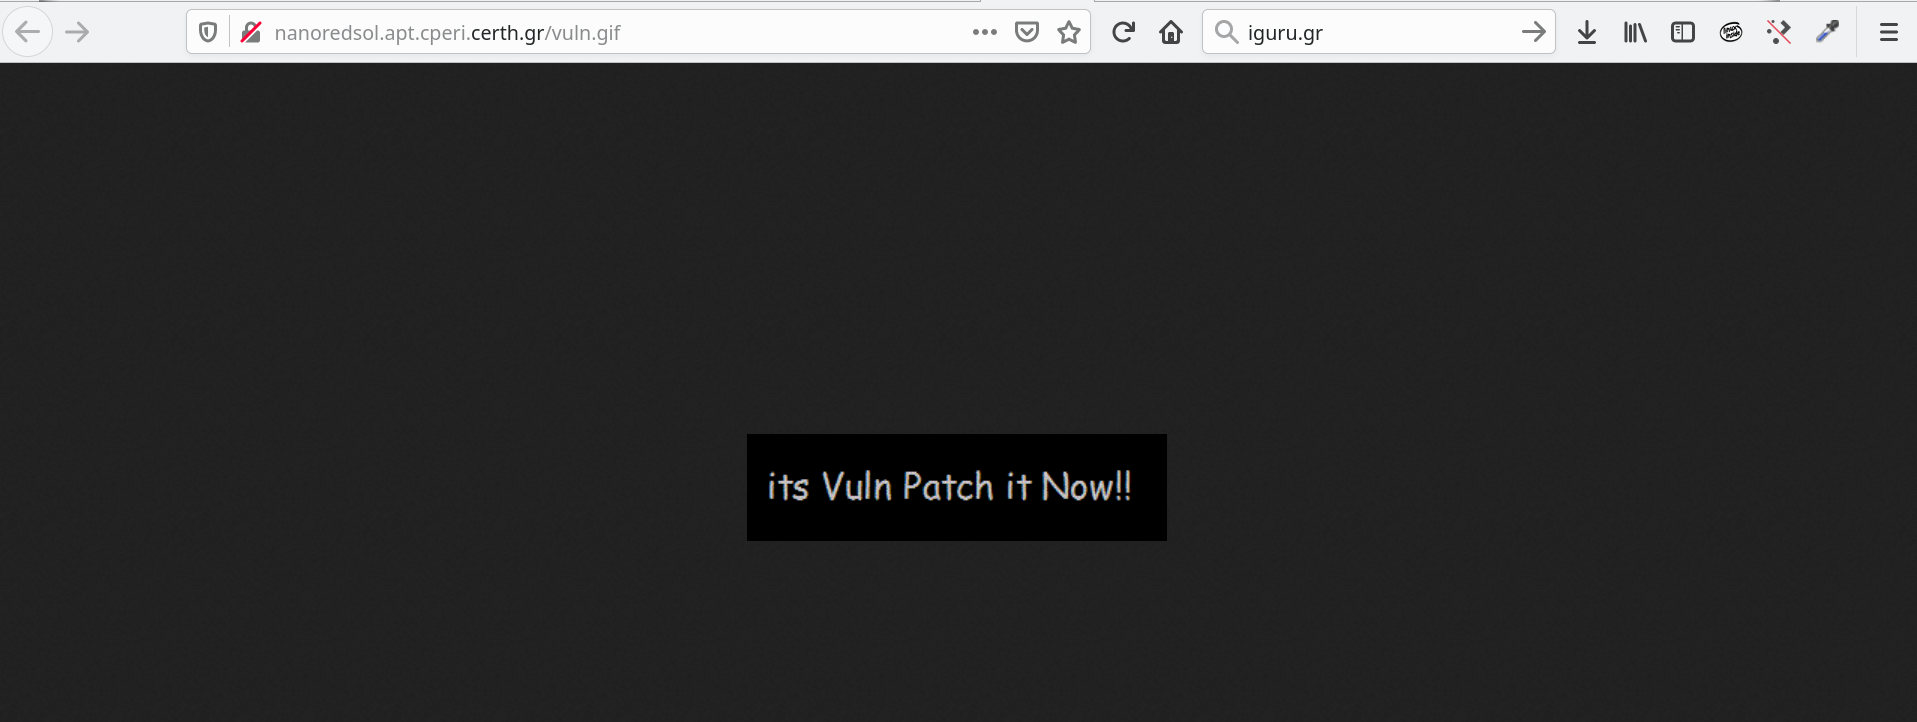 vuln - Hacked Εθνικό Κέντρο Έρευνας και Τεχνολογικής Ανάπτυξης